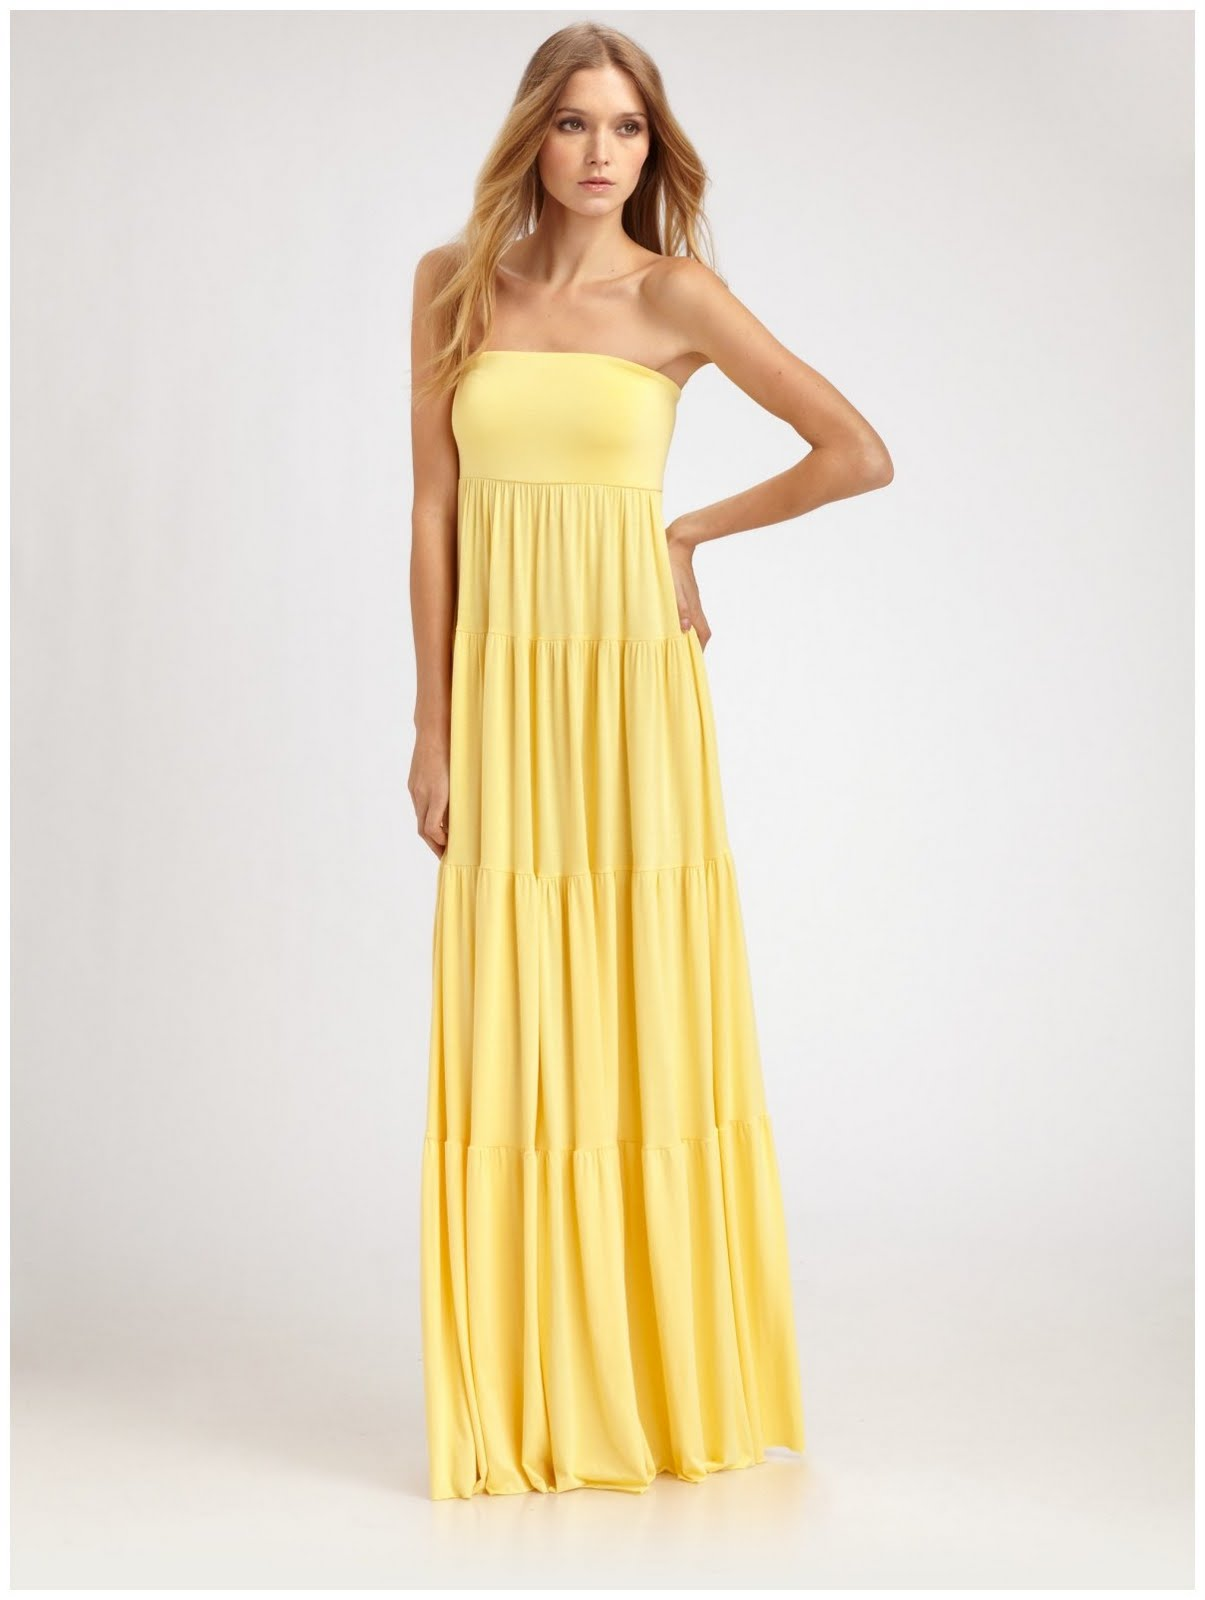 Maxi dresses 2011 maxi dresses maxi dresses for weddings for Yellow maxi dress for wedding